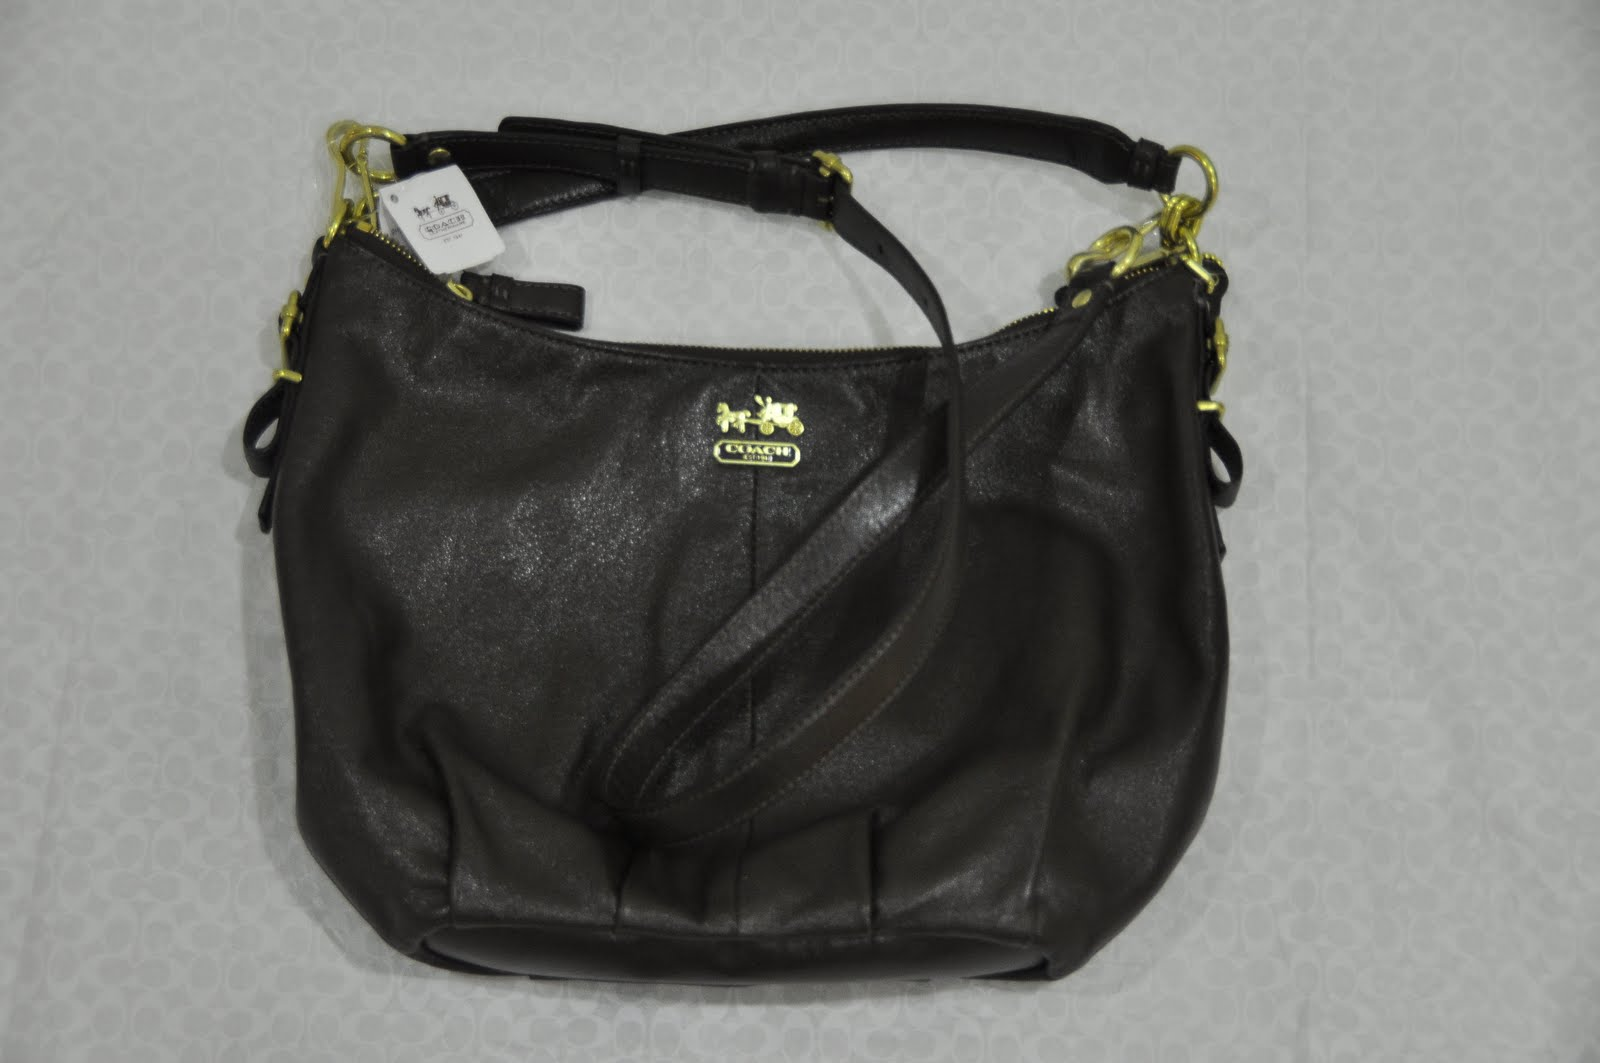 5a8409d2ace gucci blackberry cheap for men cheap gucci briefcase handbags online